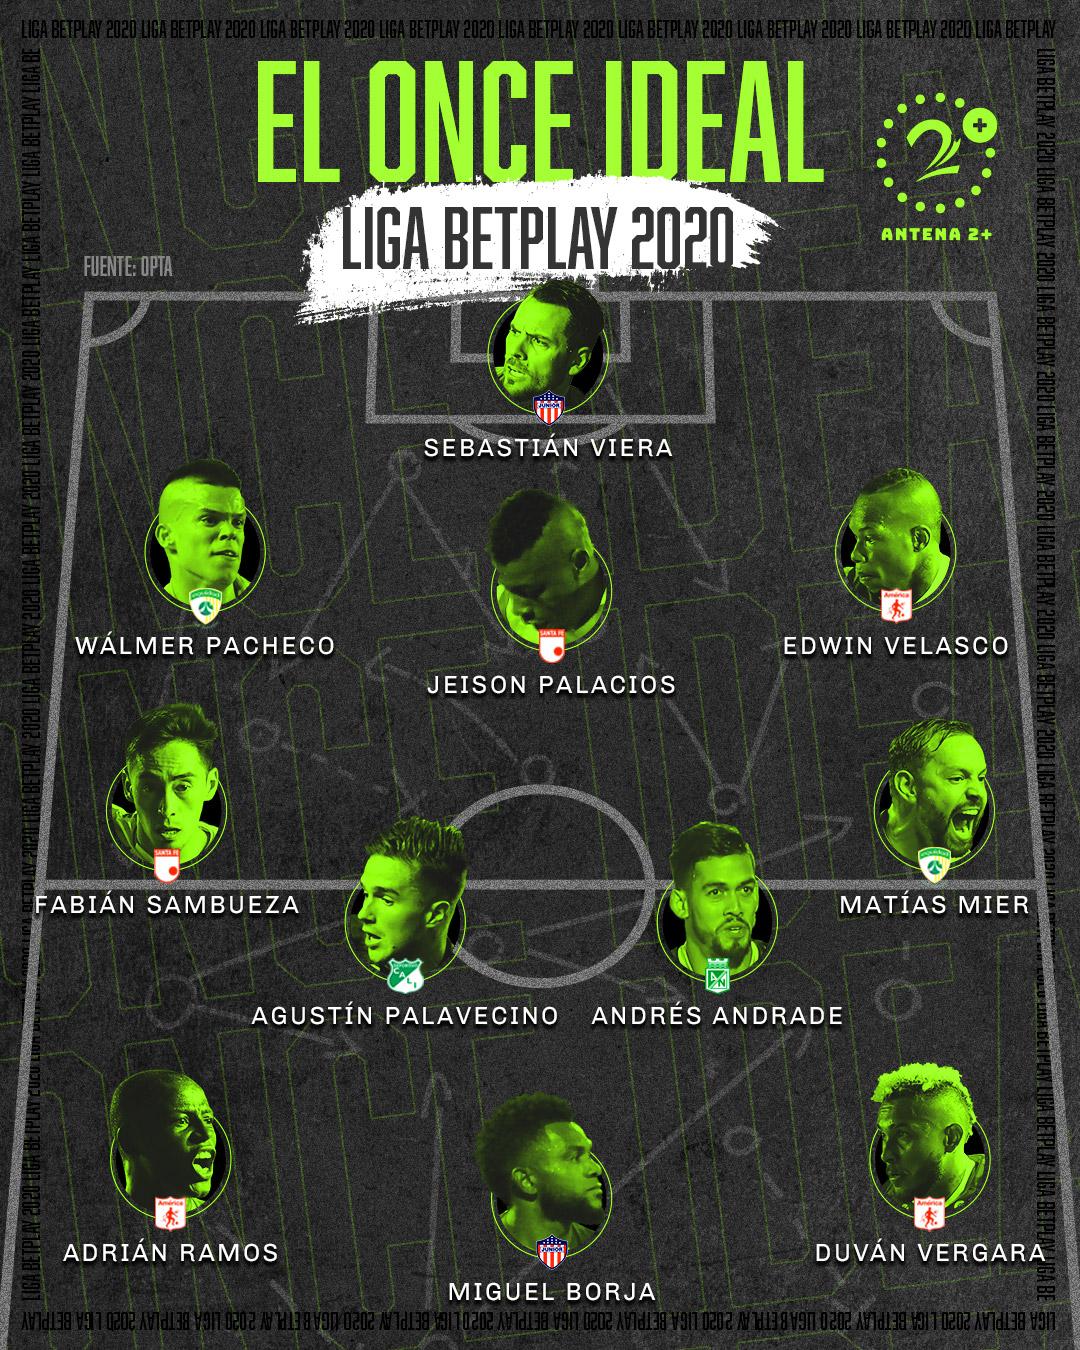 Once ideal Liga Betplay 2020